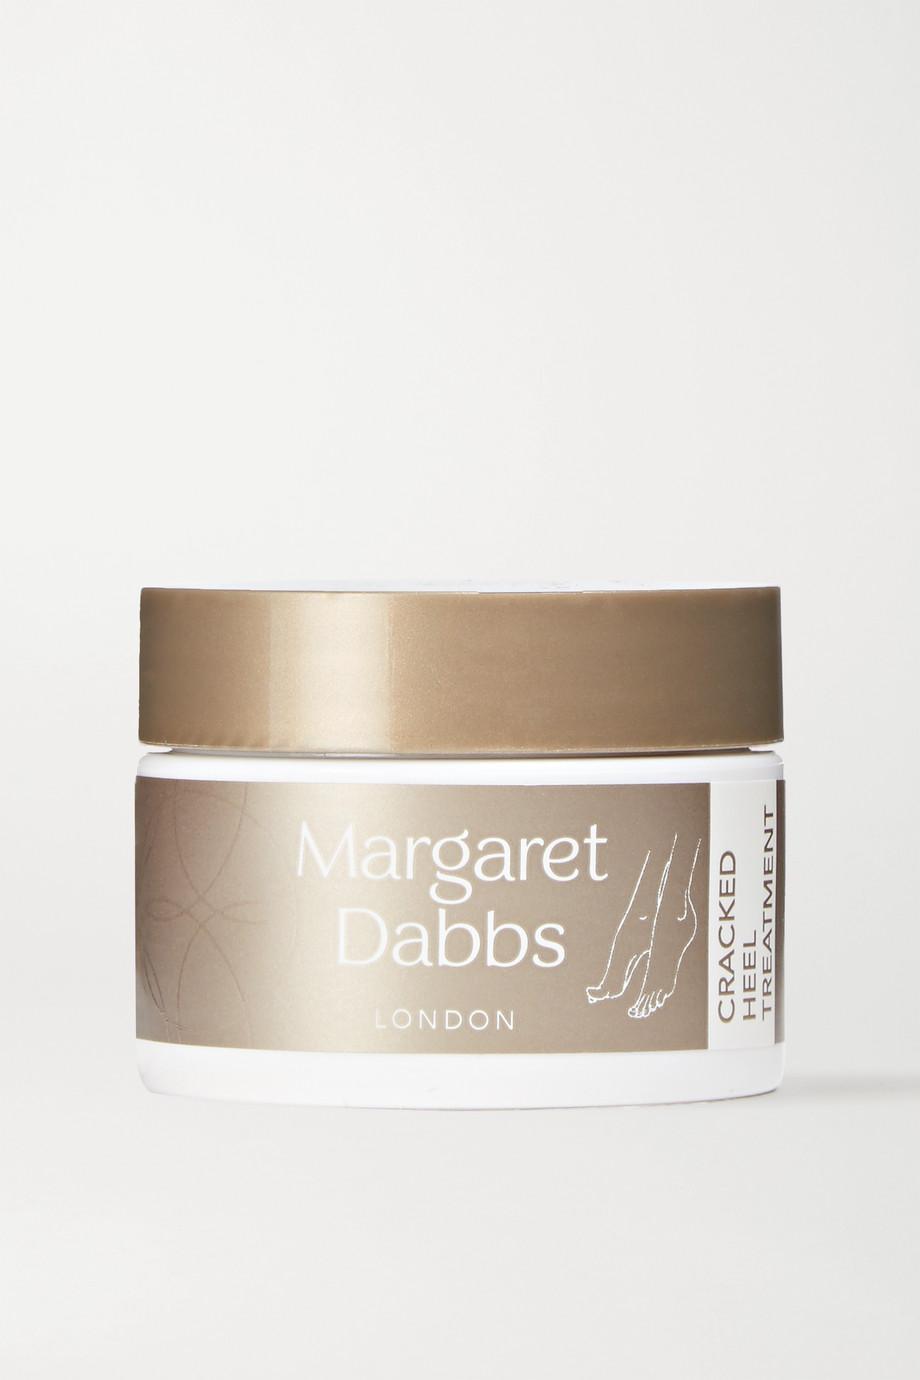 Margaret Dabbs London Cracked Heel Treatment, 30 ml – Balsam